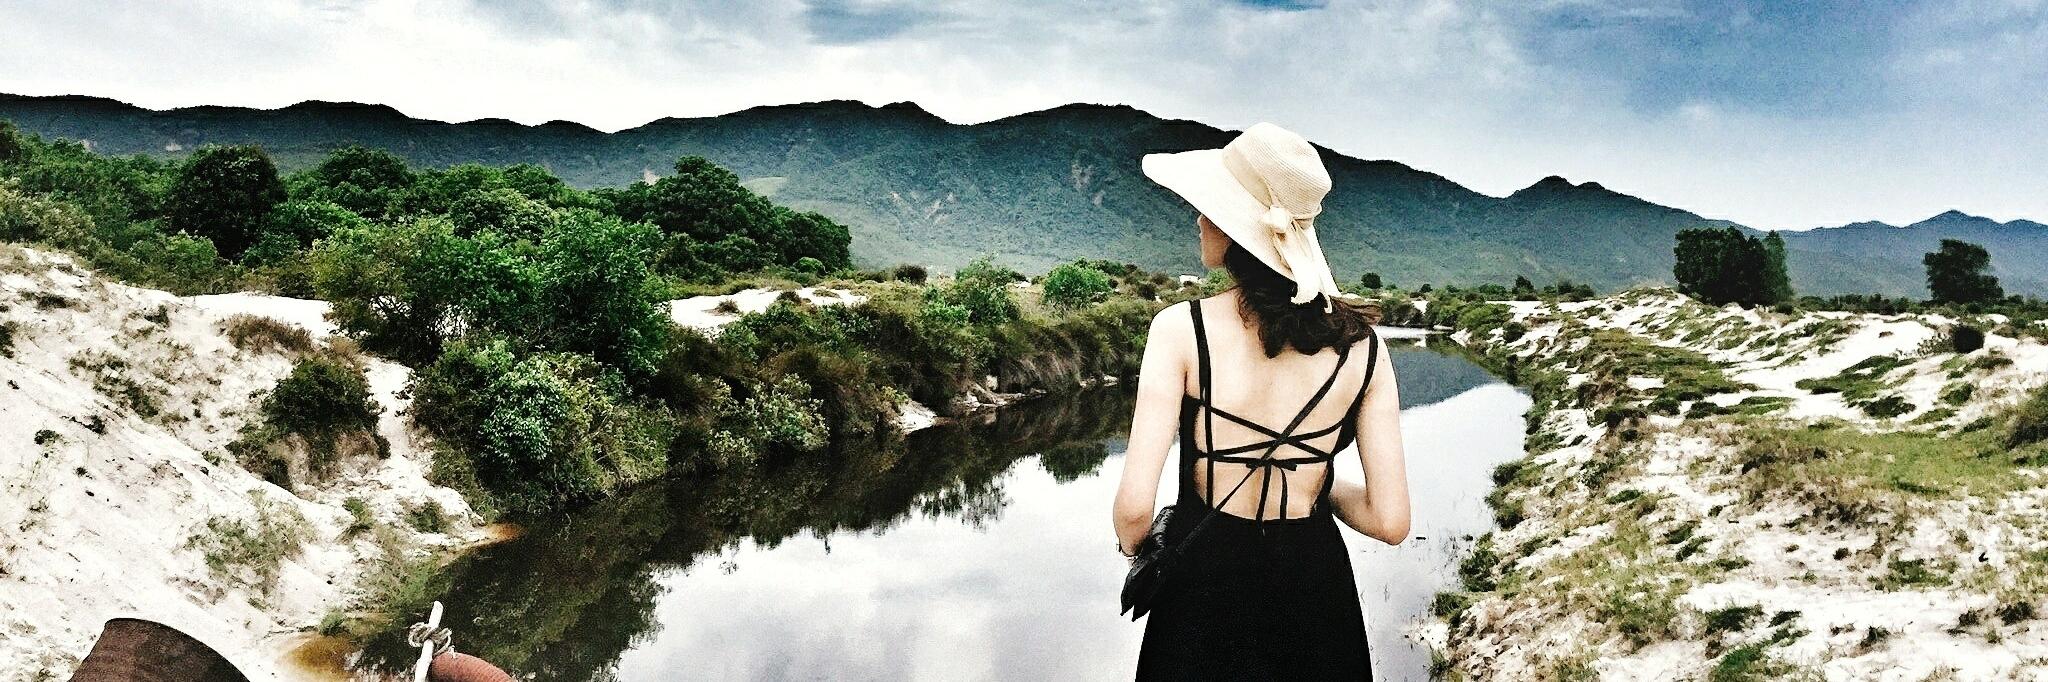 https://gody.vn/blog/myfoot5886/post/review-plantrip-danh-tan-con-khat-du-lich-chi-voi-2-ngay-cuoi-tuan-tai-quan-lan-hoang-so-danh-cho-2-nguoi-3730